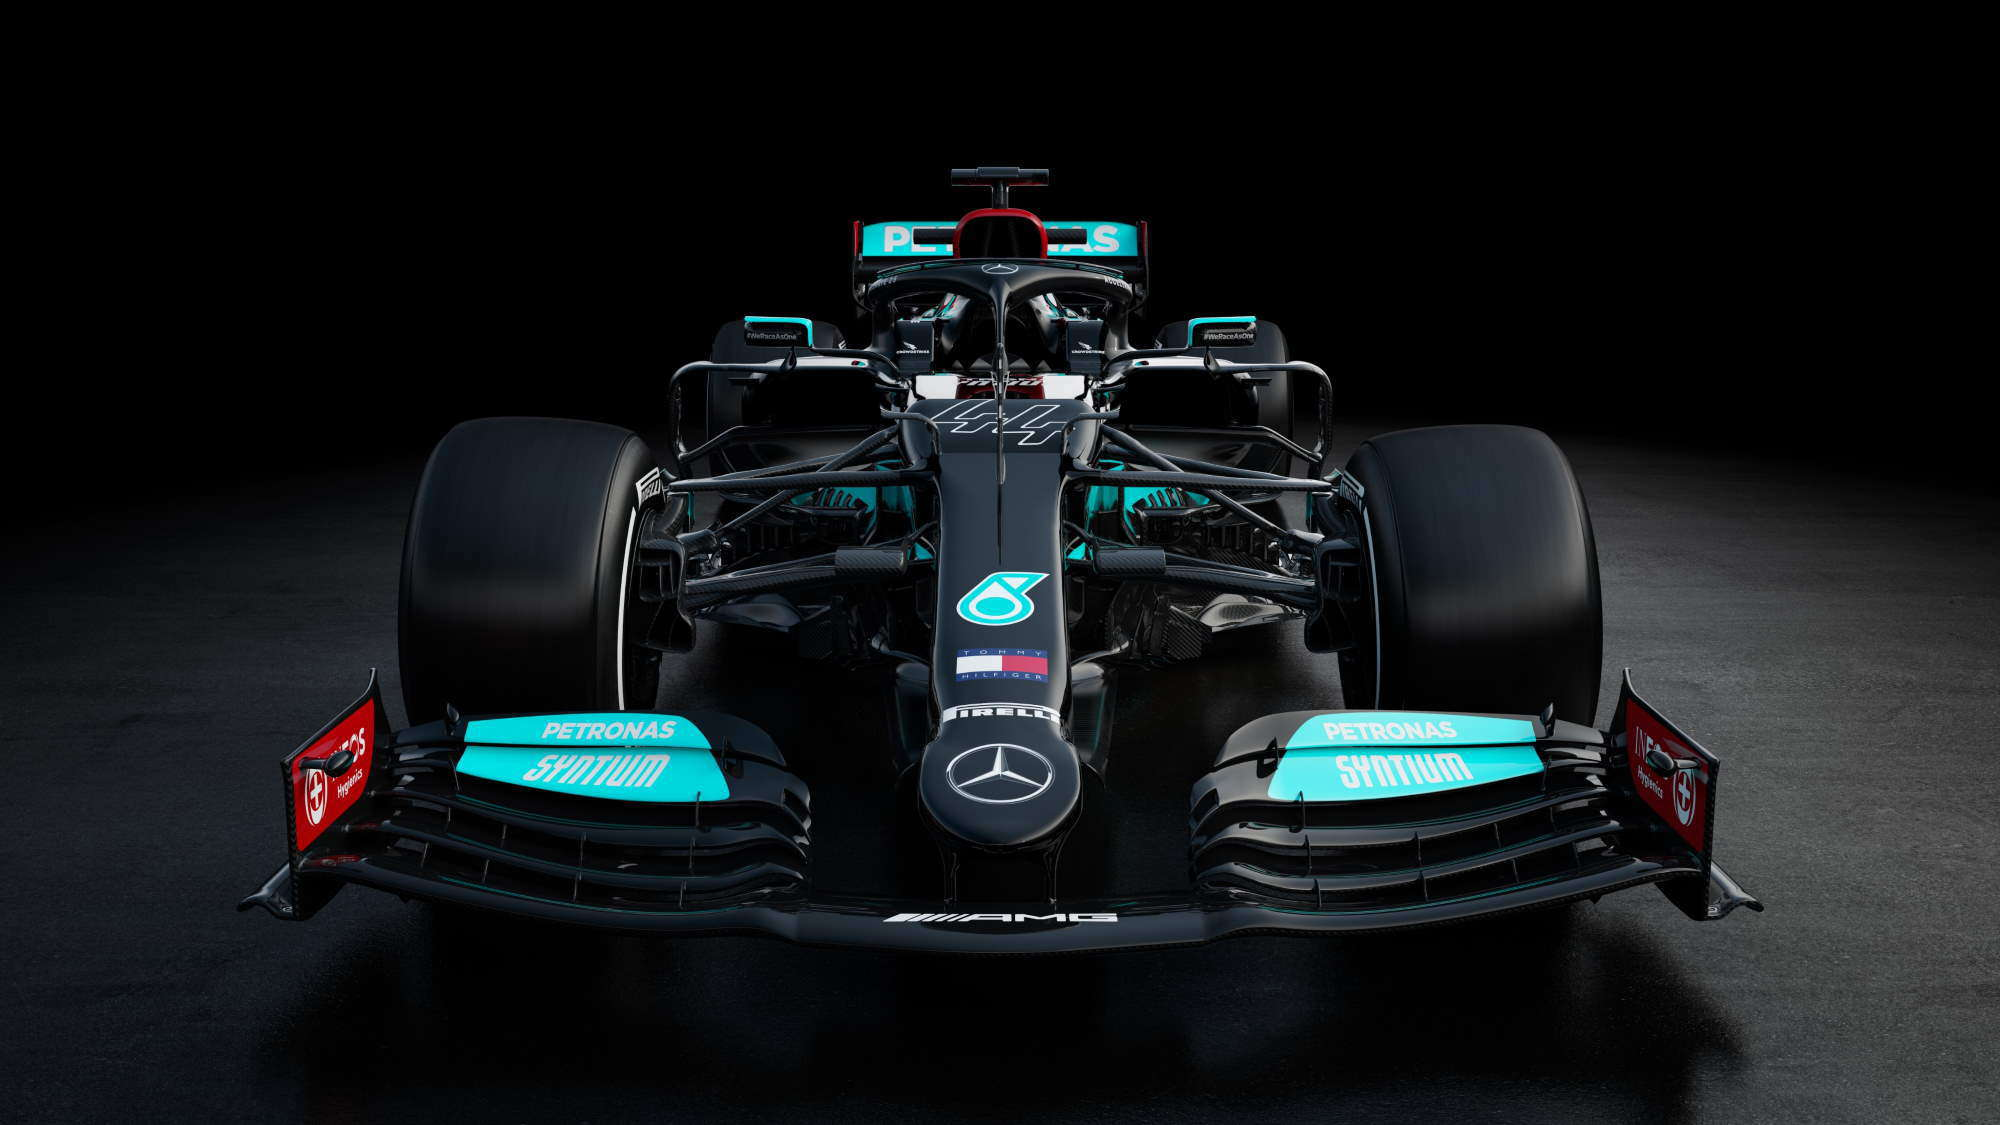 2021 Mercedes F1 W12 studio photo front Photo Mercedes AMG Petronas Twitter